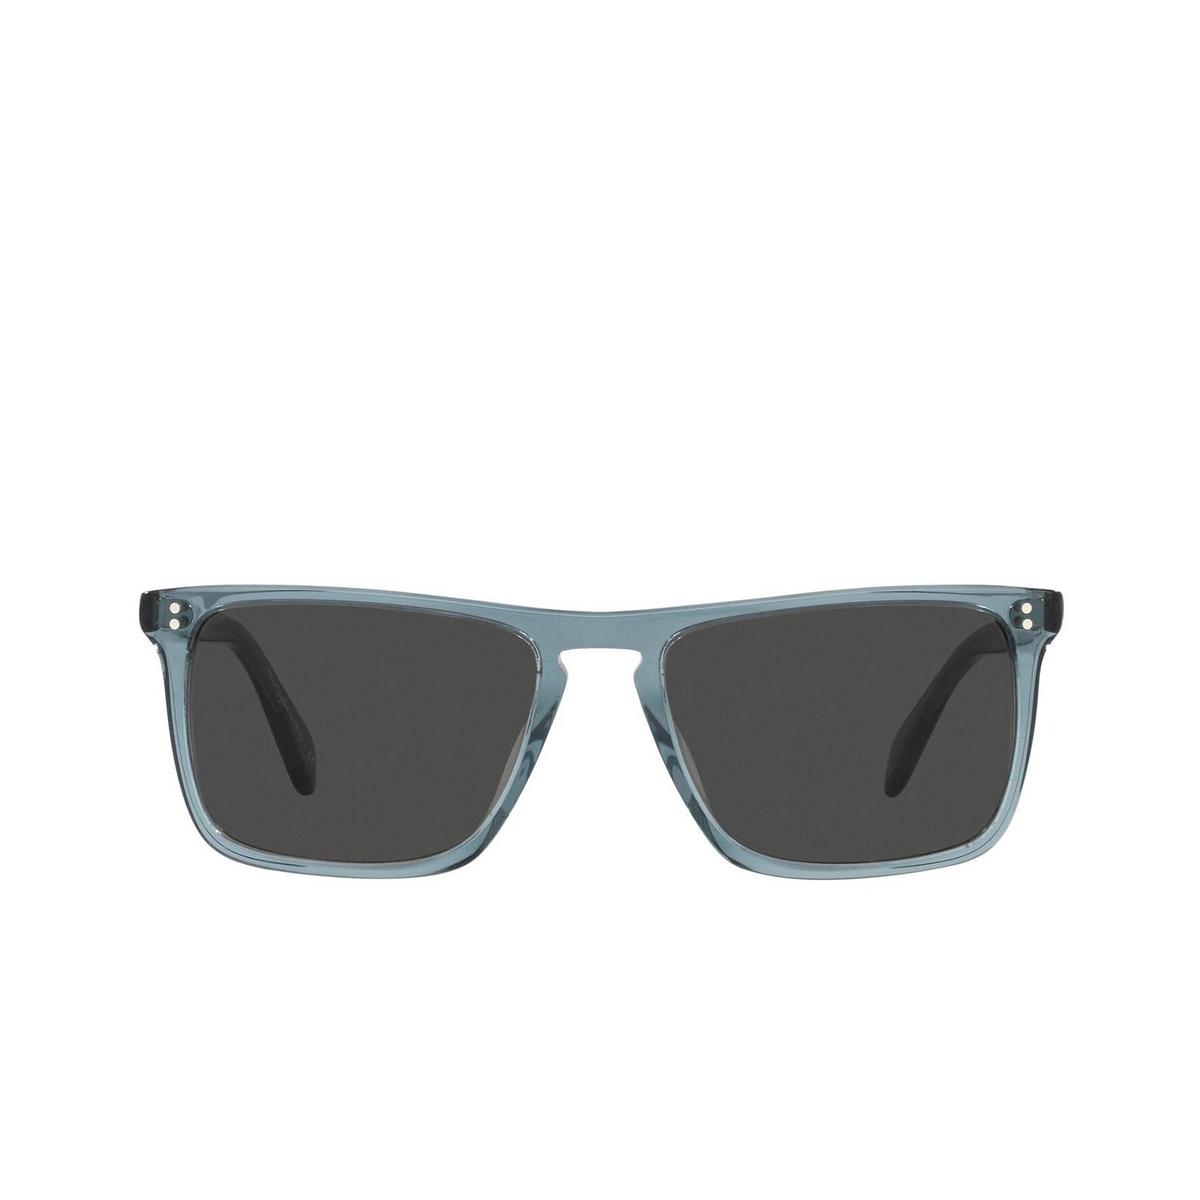 Oliver Peoples® Square Sunglasses: Bernardo OV5189S color Washed Teal 1617R5 - front view.